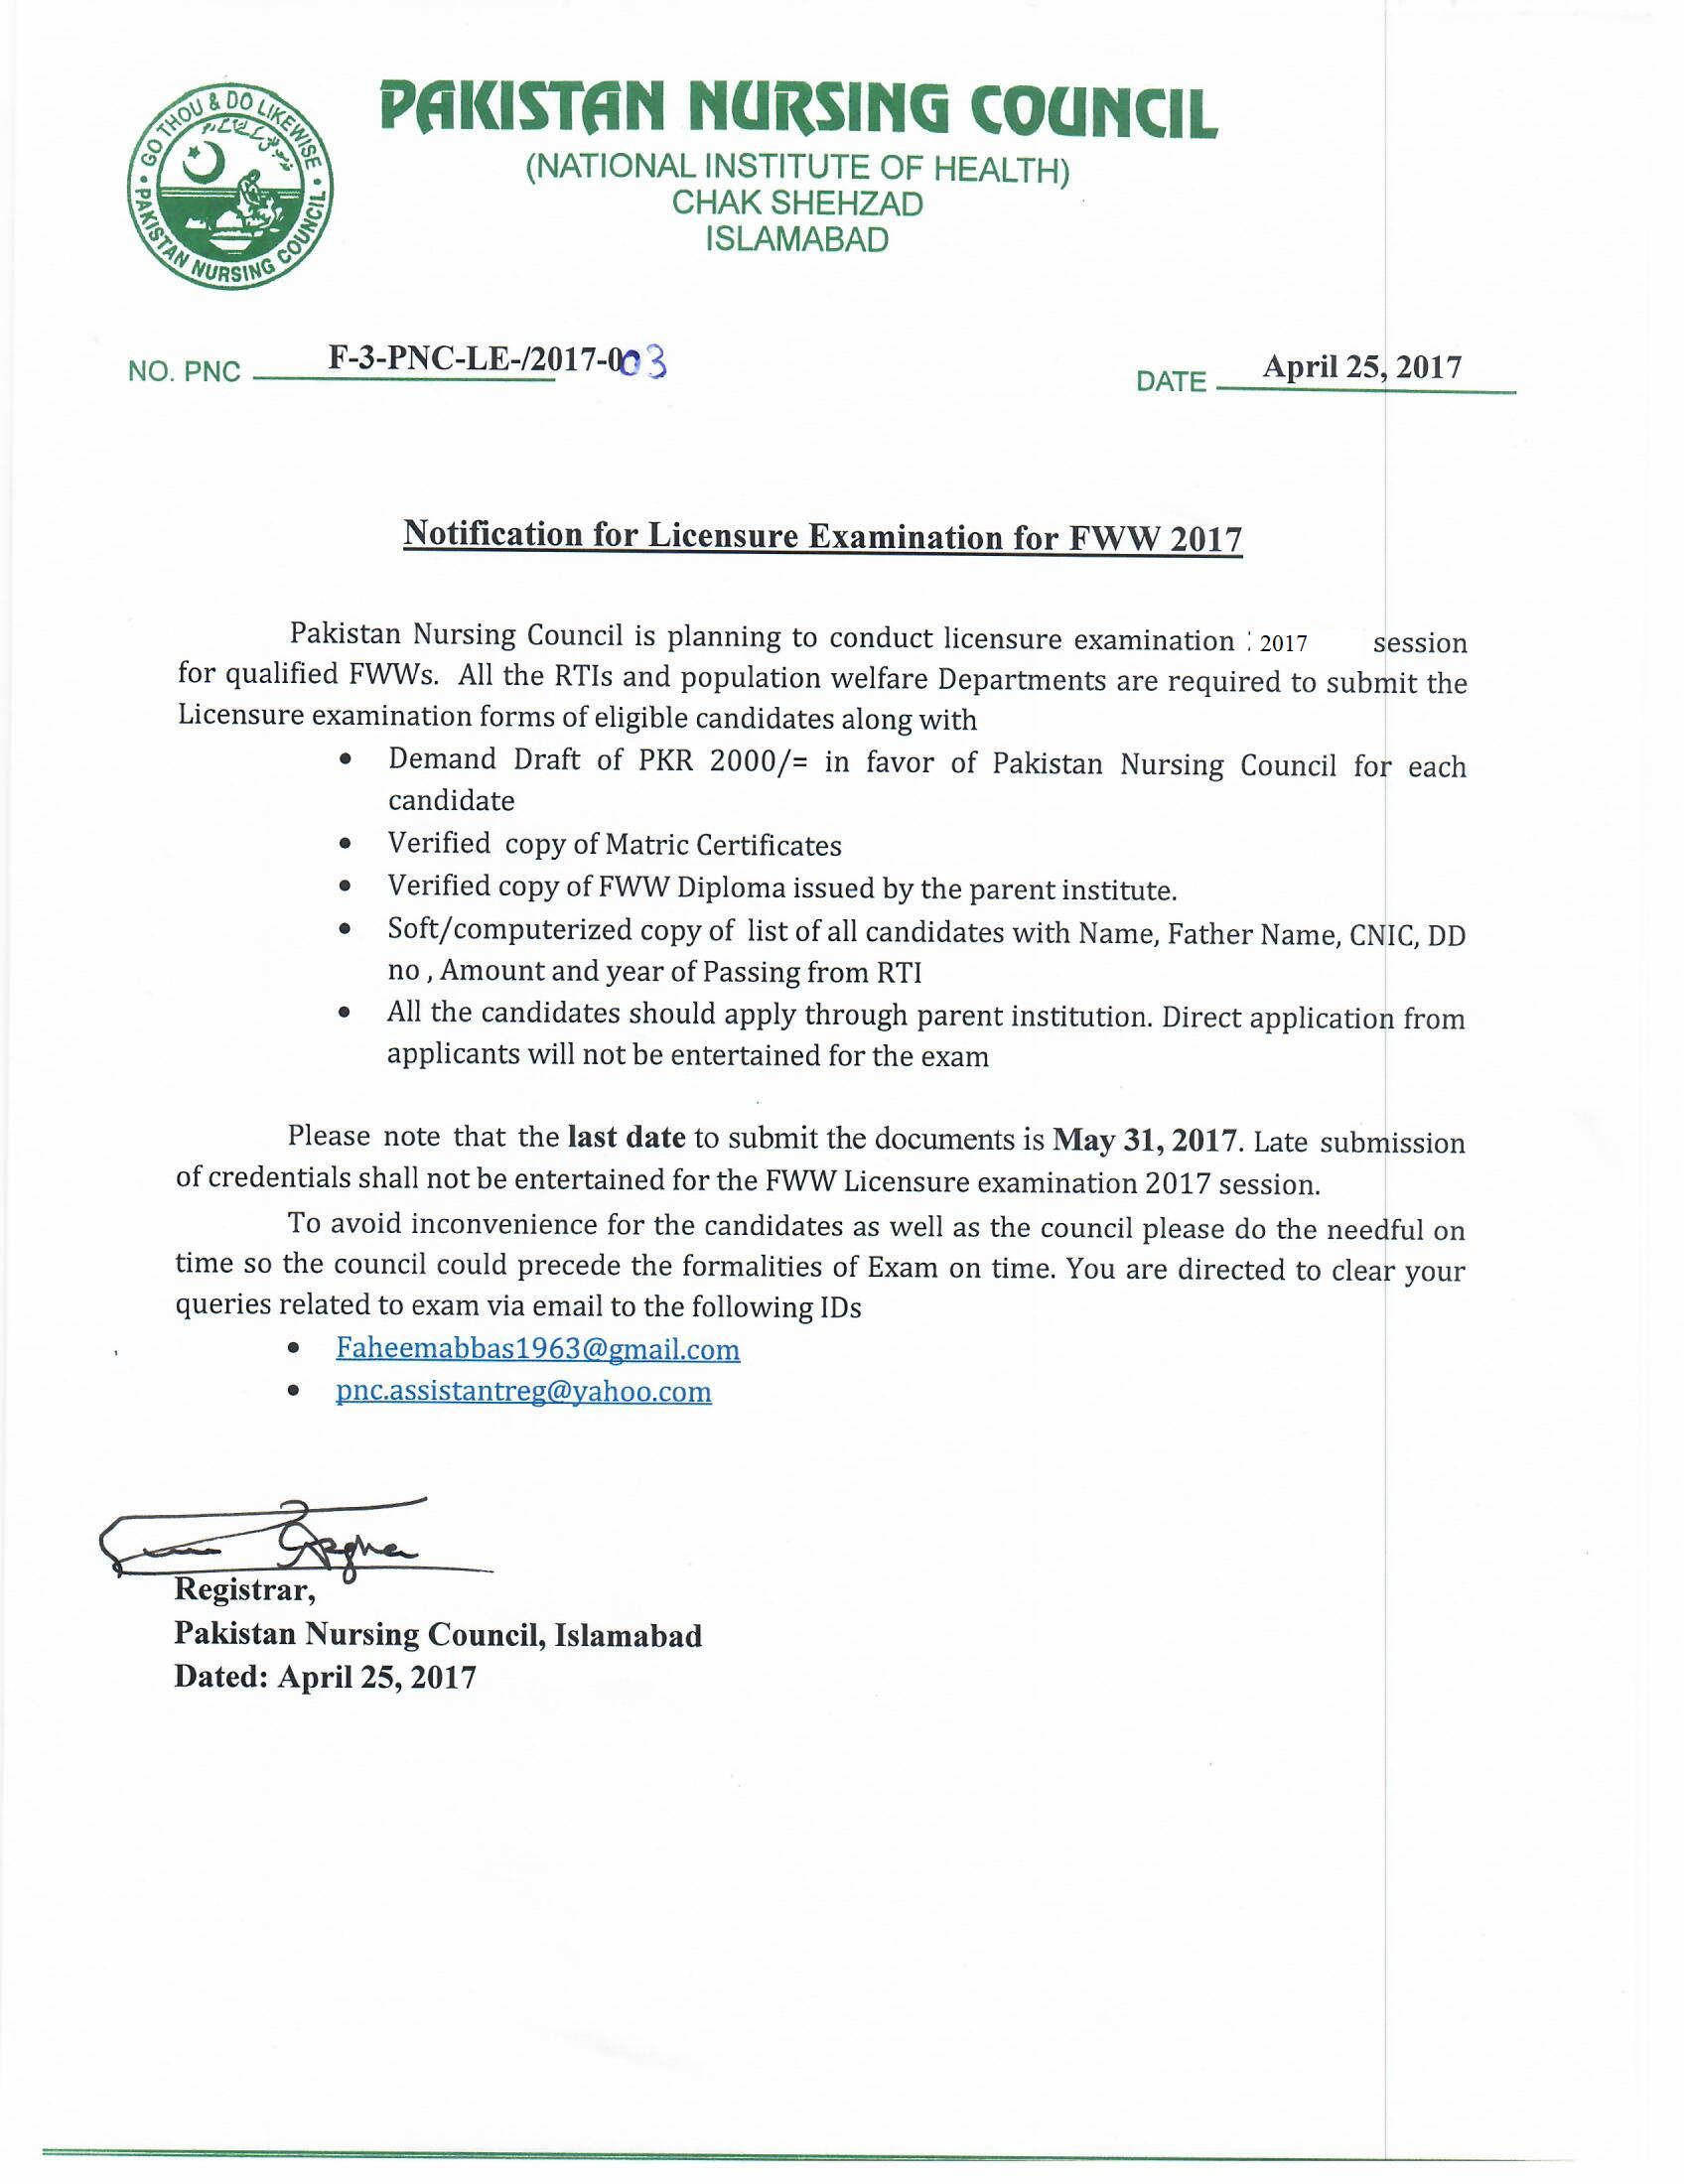 Licensing Examination Schedule